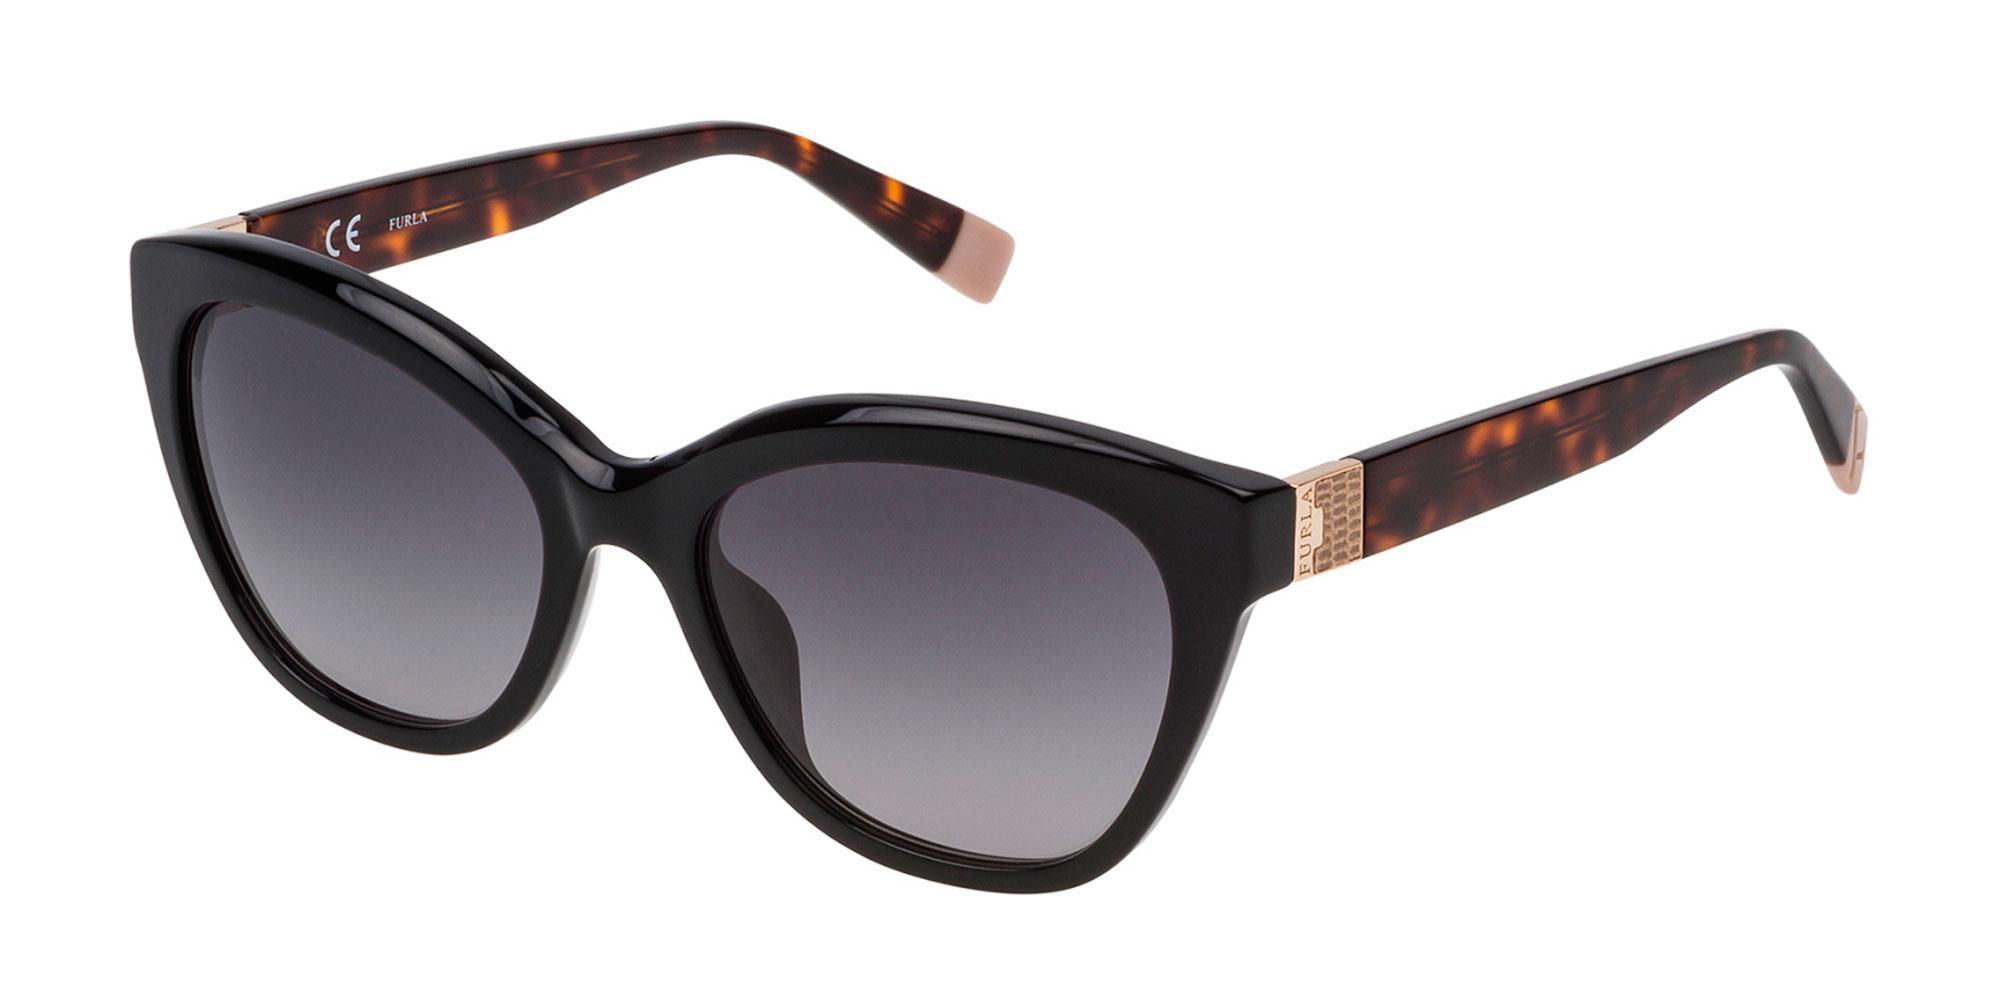 0700 SFU040 Sunglasses, Furla